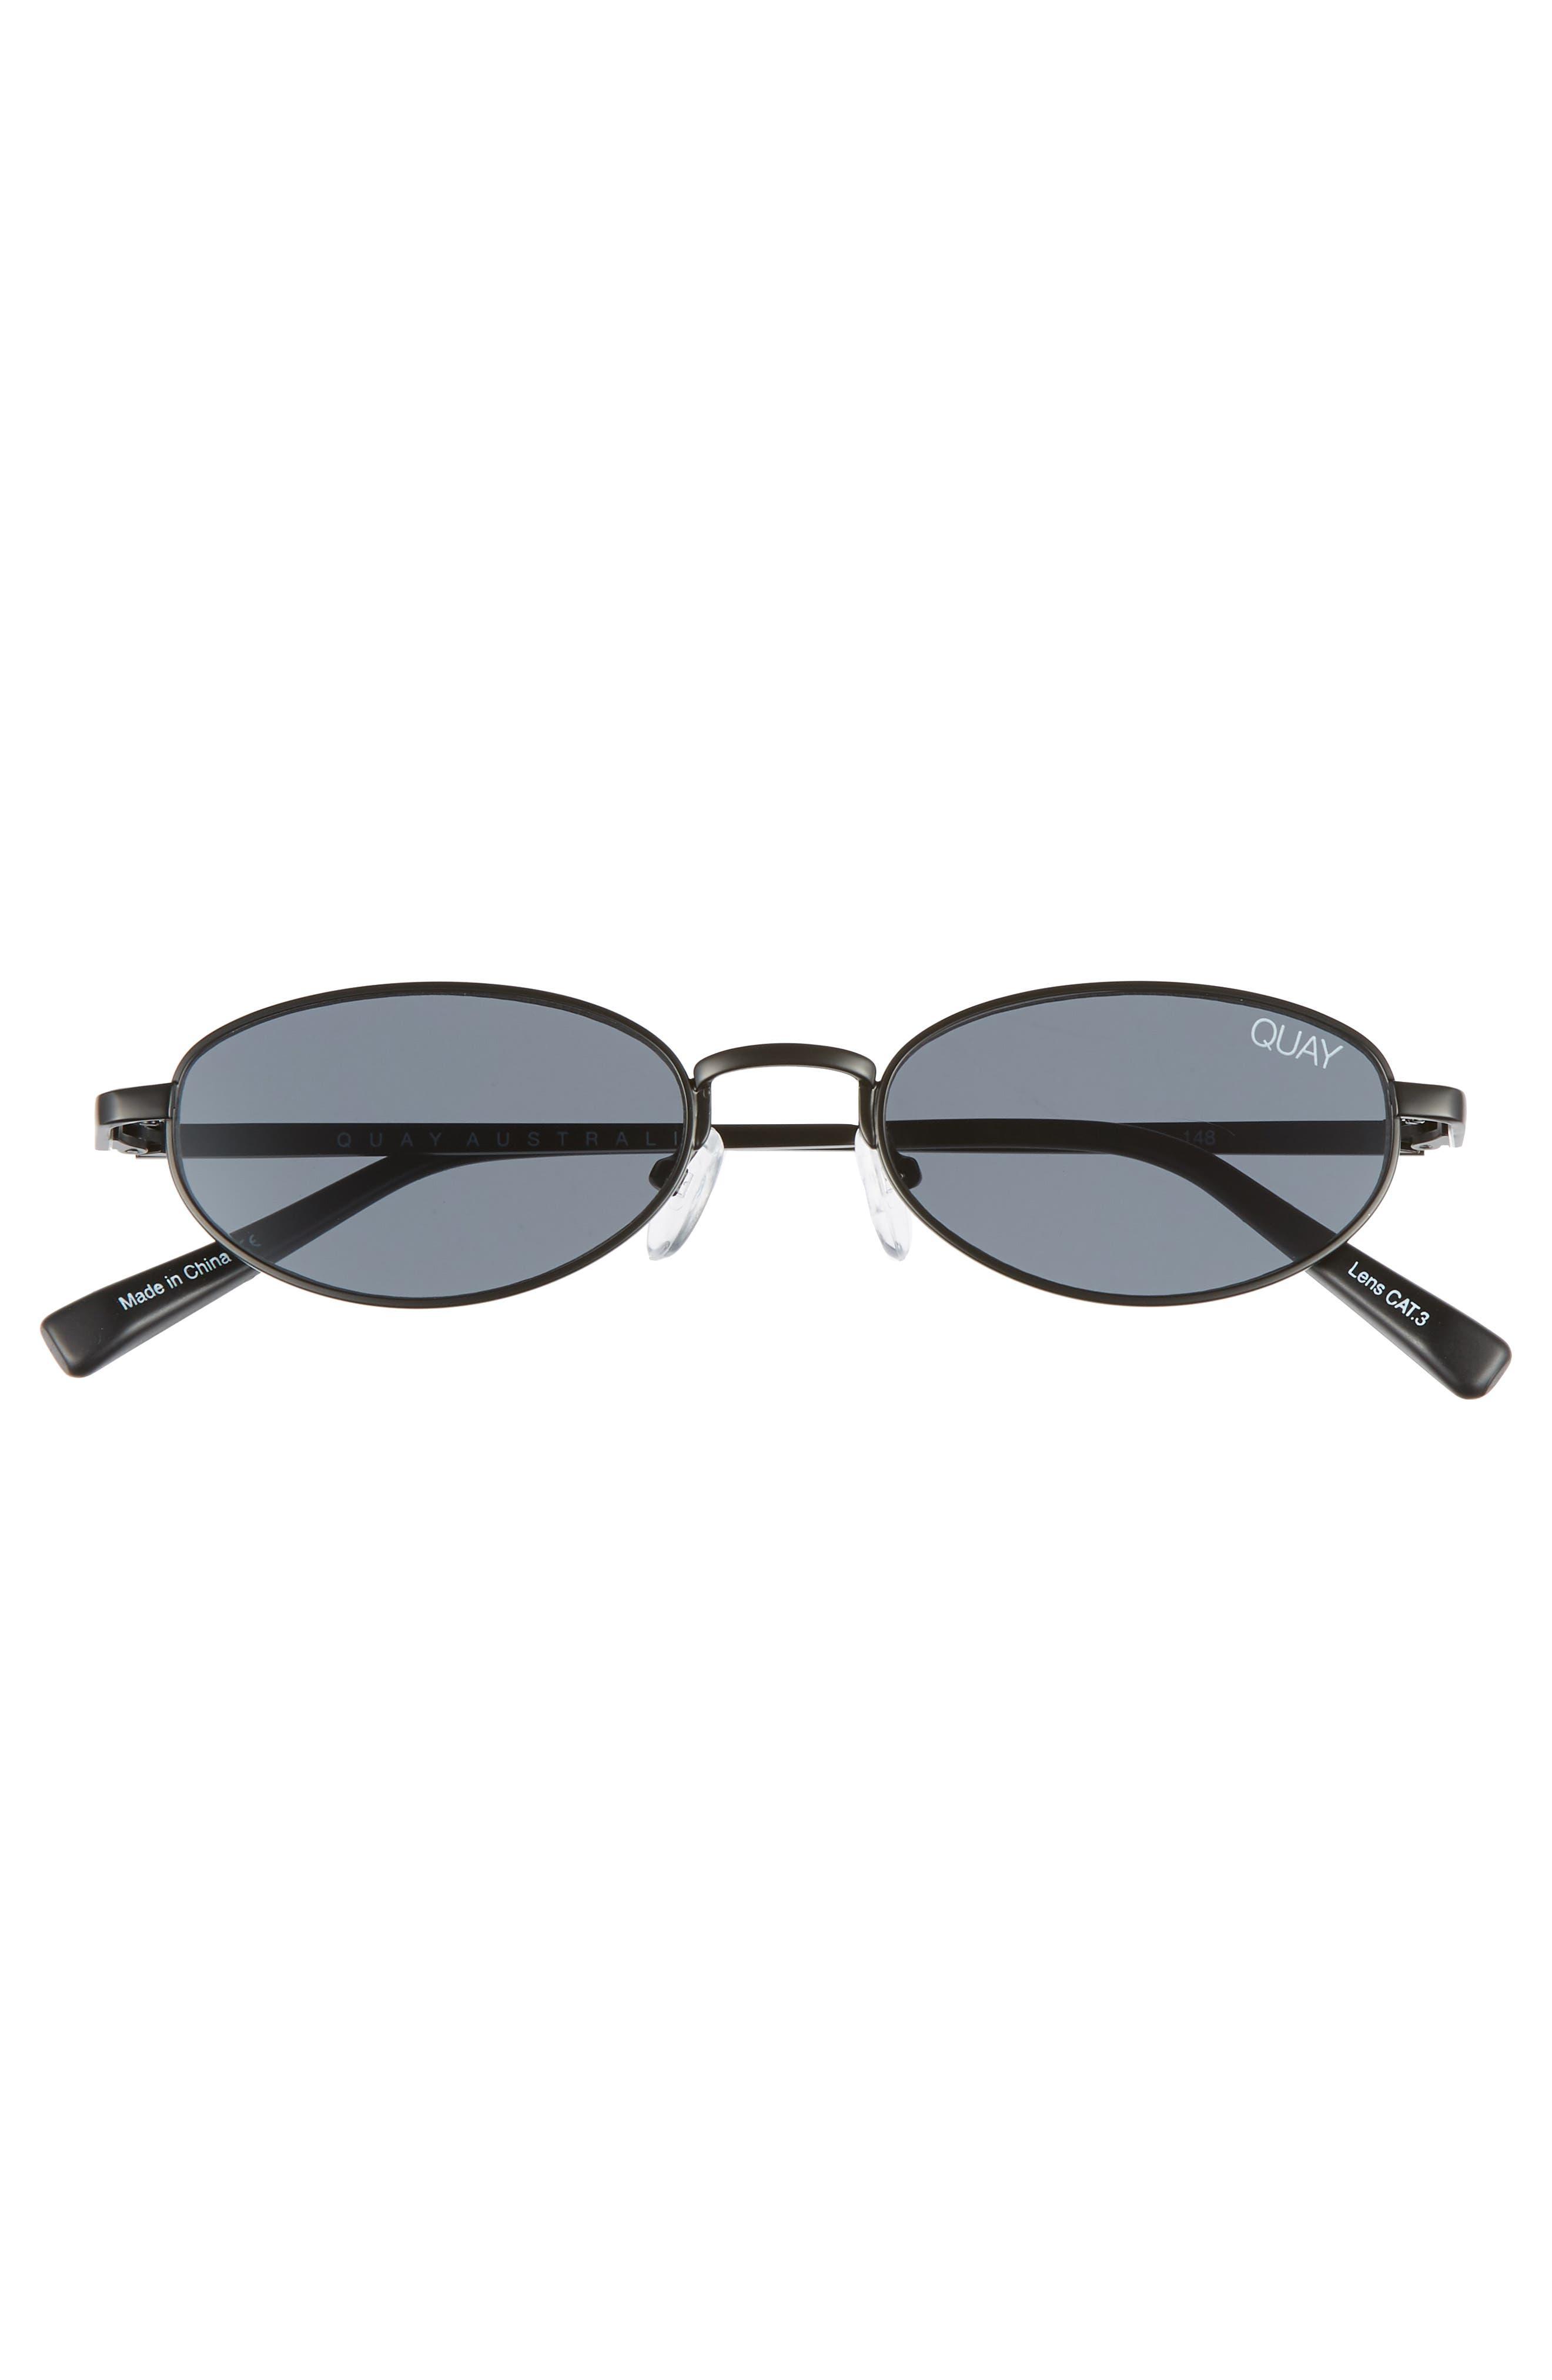 49mm Showdown Oval Sunglasses,                             Alternate thumbnail 3, color,                             BLACK/ SMOKE